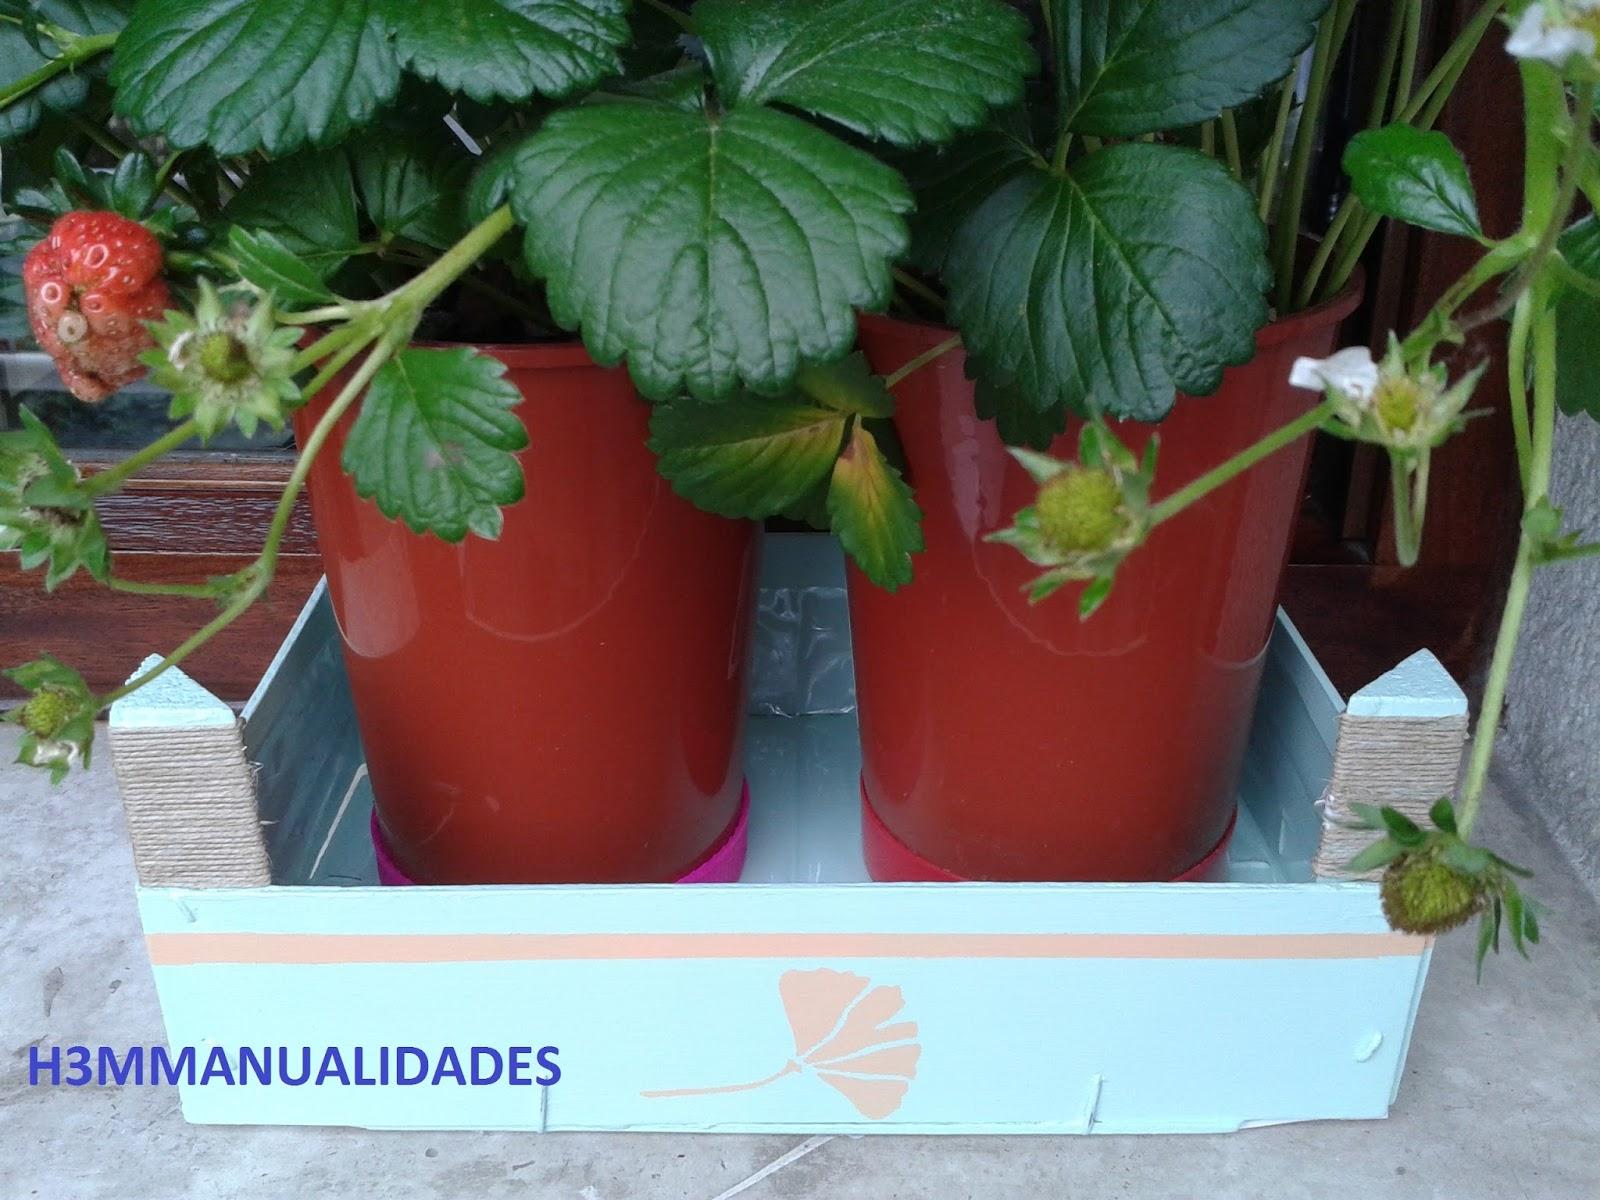 H3m manualidades caja de fresas ya fuera de temporada - Cajas de frutas ...